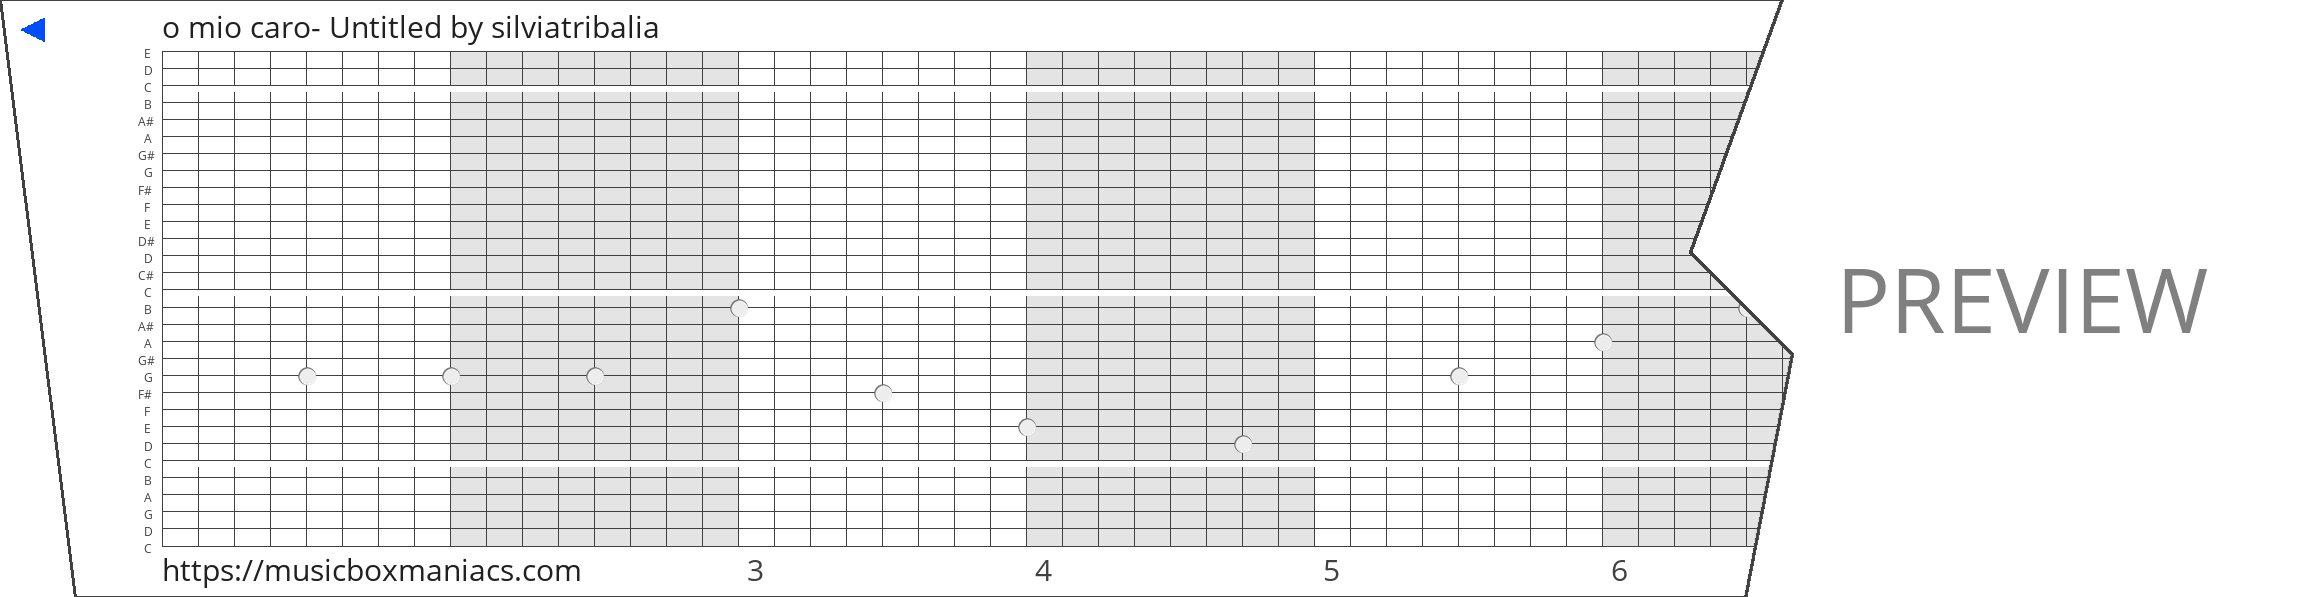 o mio caro- Untitled 30 note music box paper strip